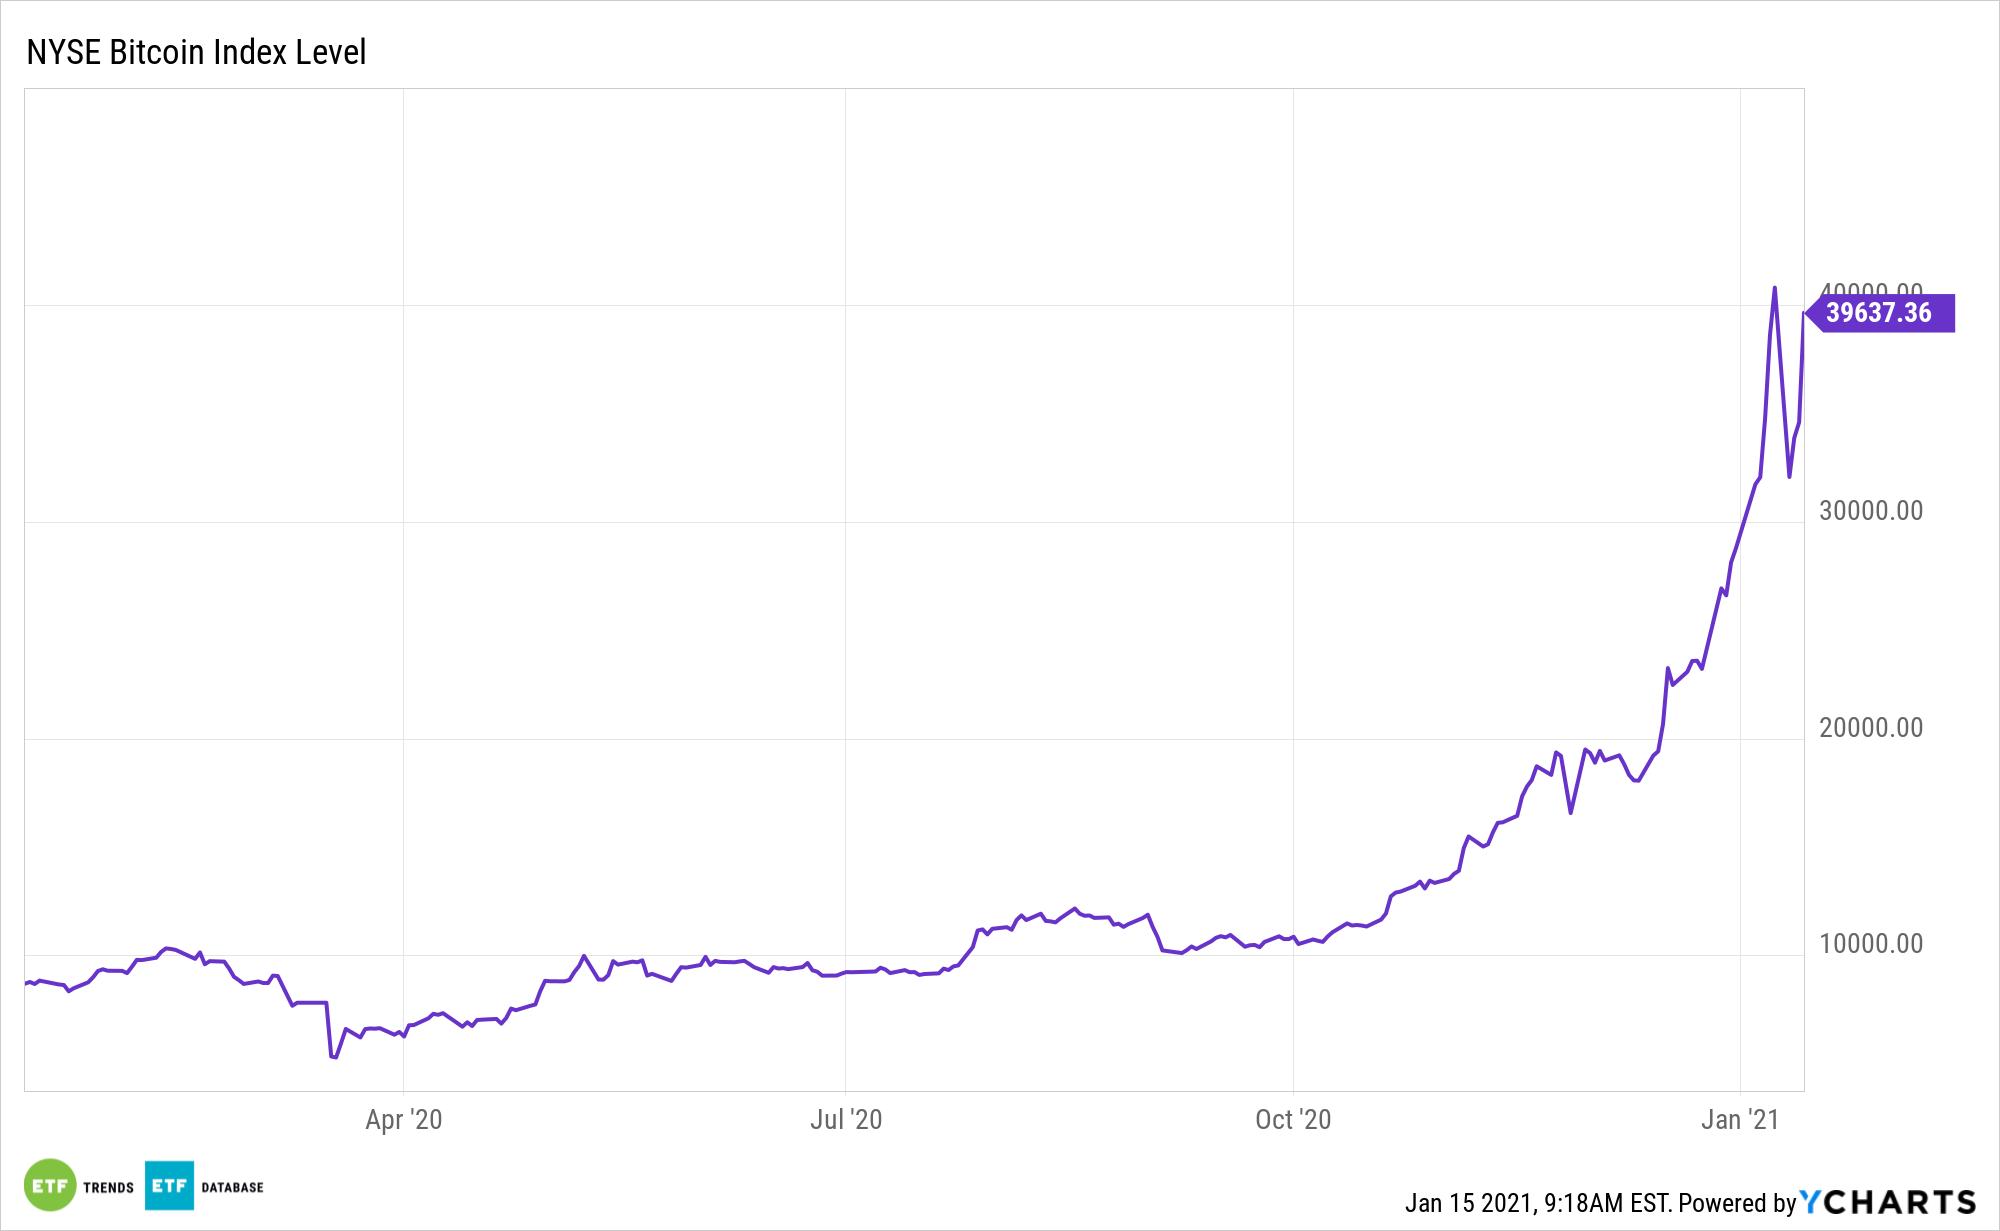 Chỉ số Bitcoin NYSE 1 năm